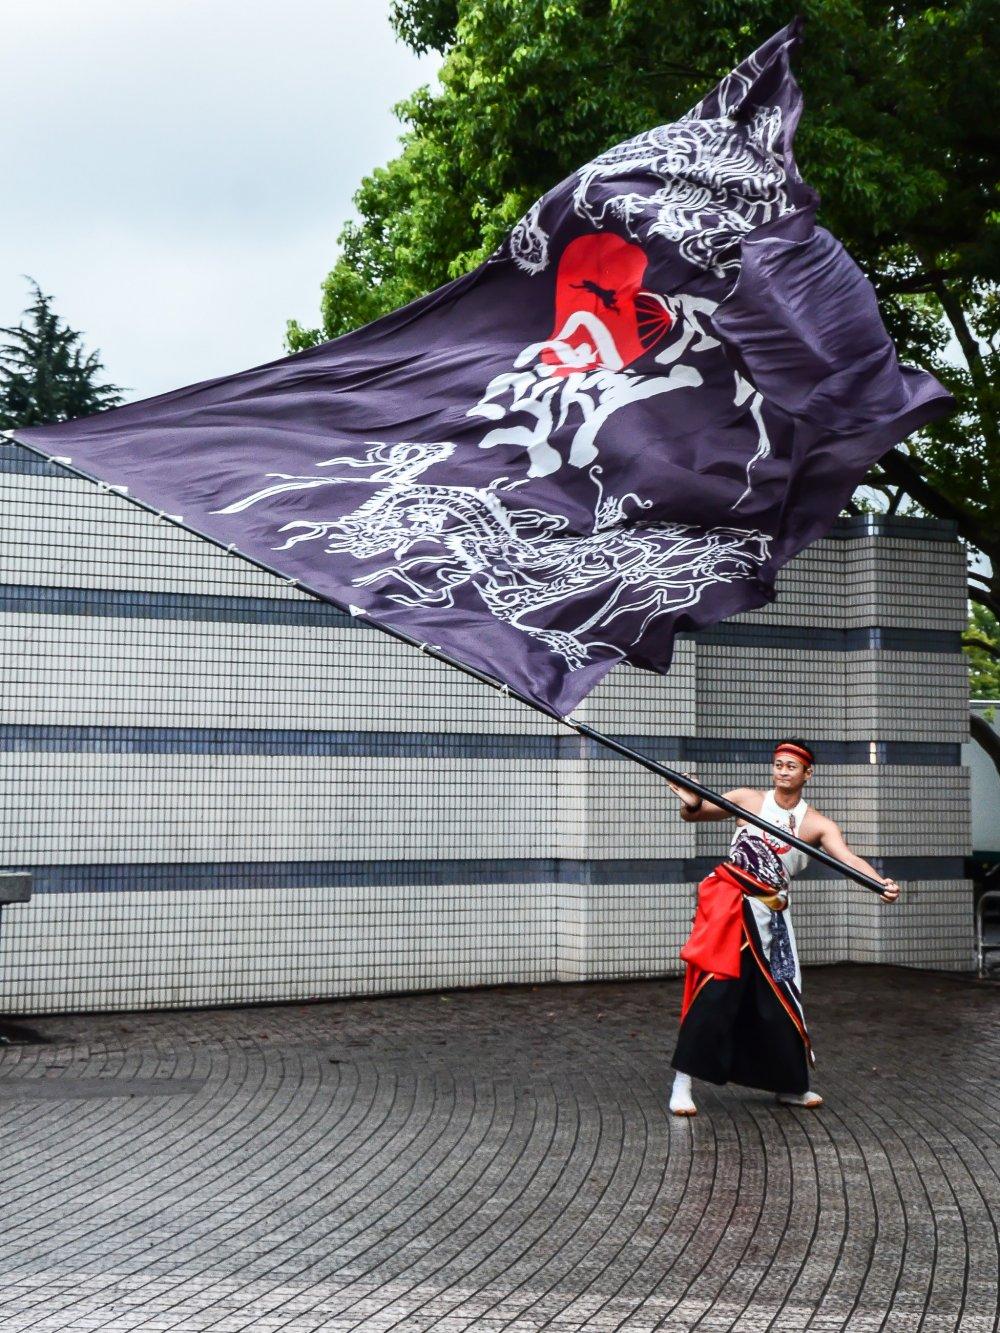 Setiap tim akan membawa bendera besar, lambang dari klub tari mereka